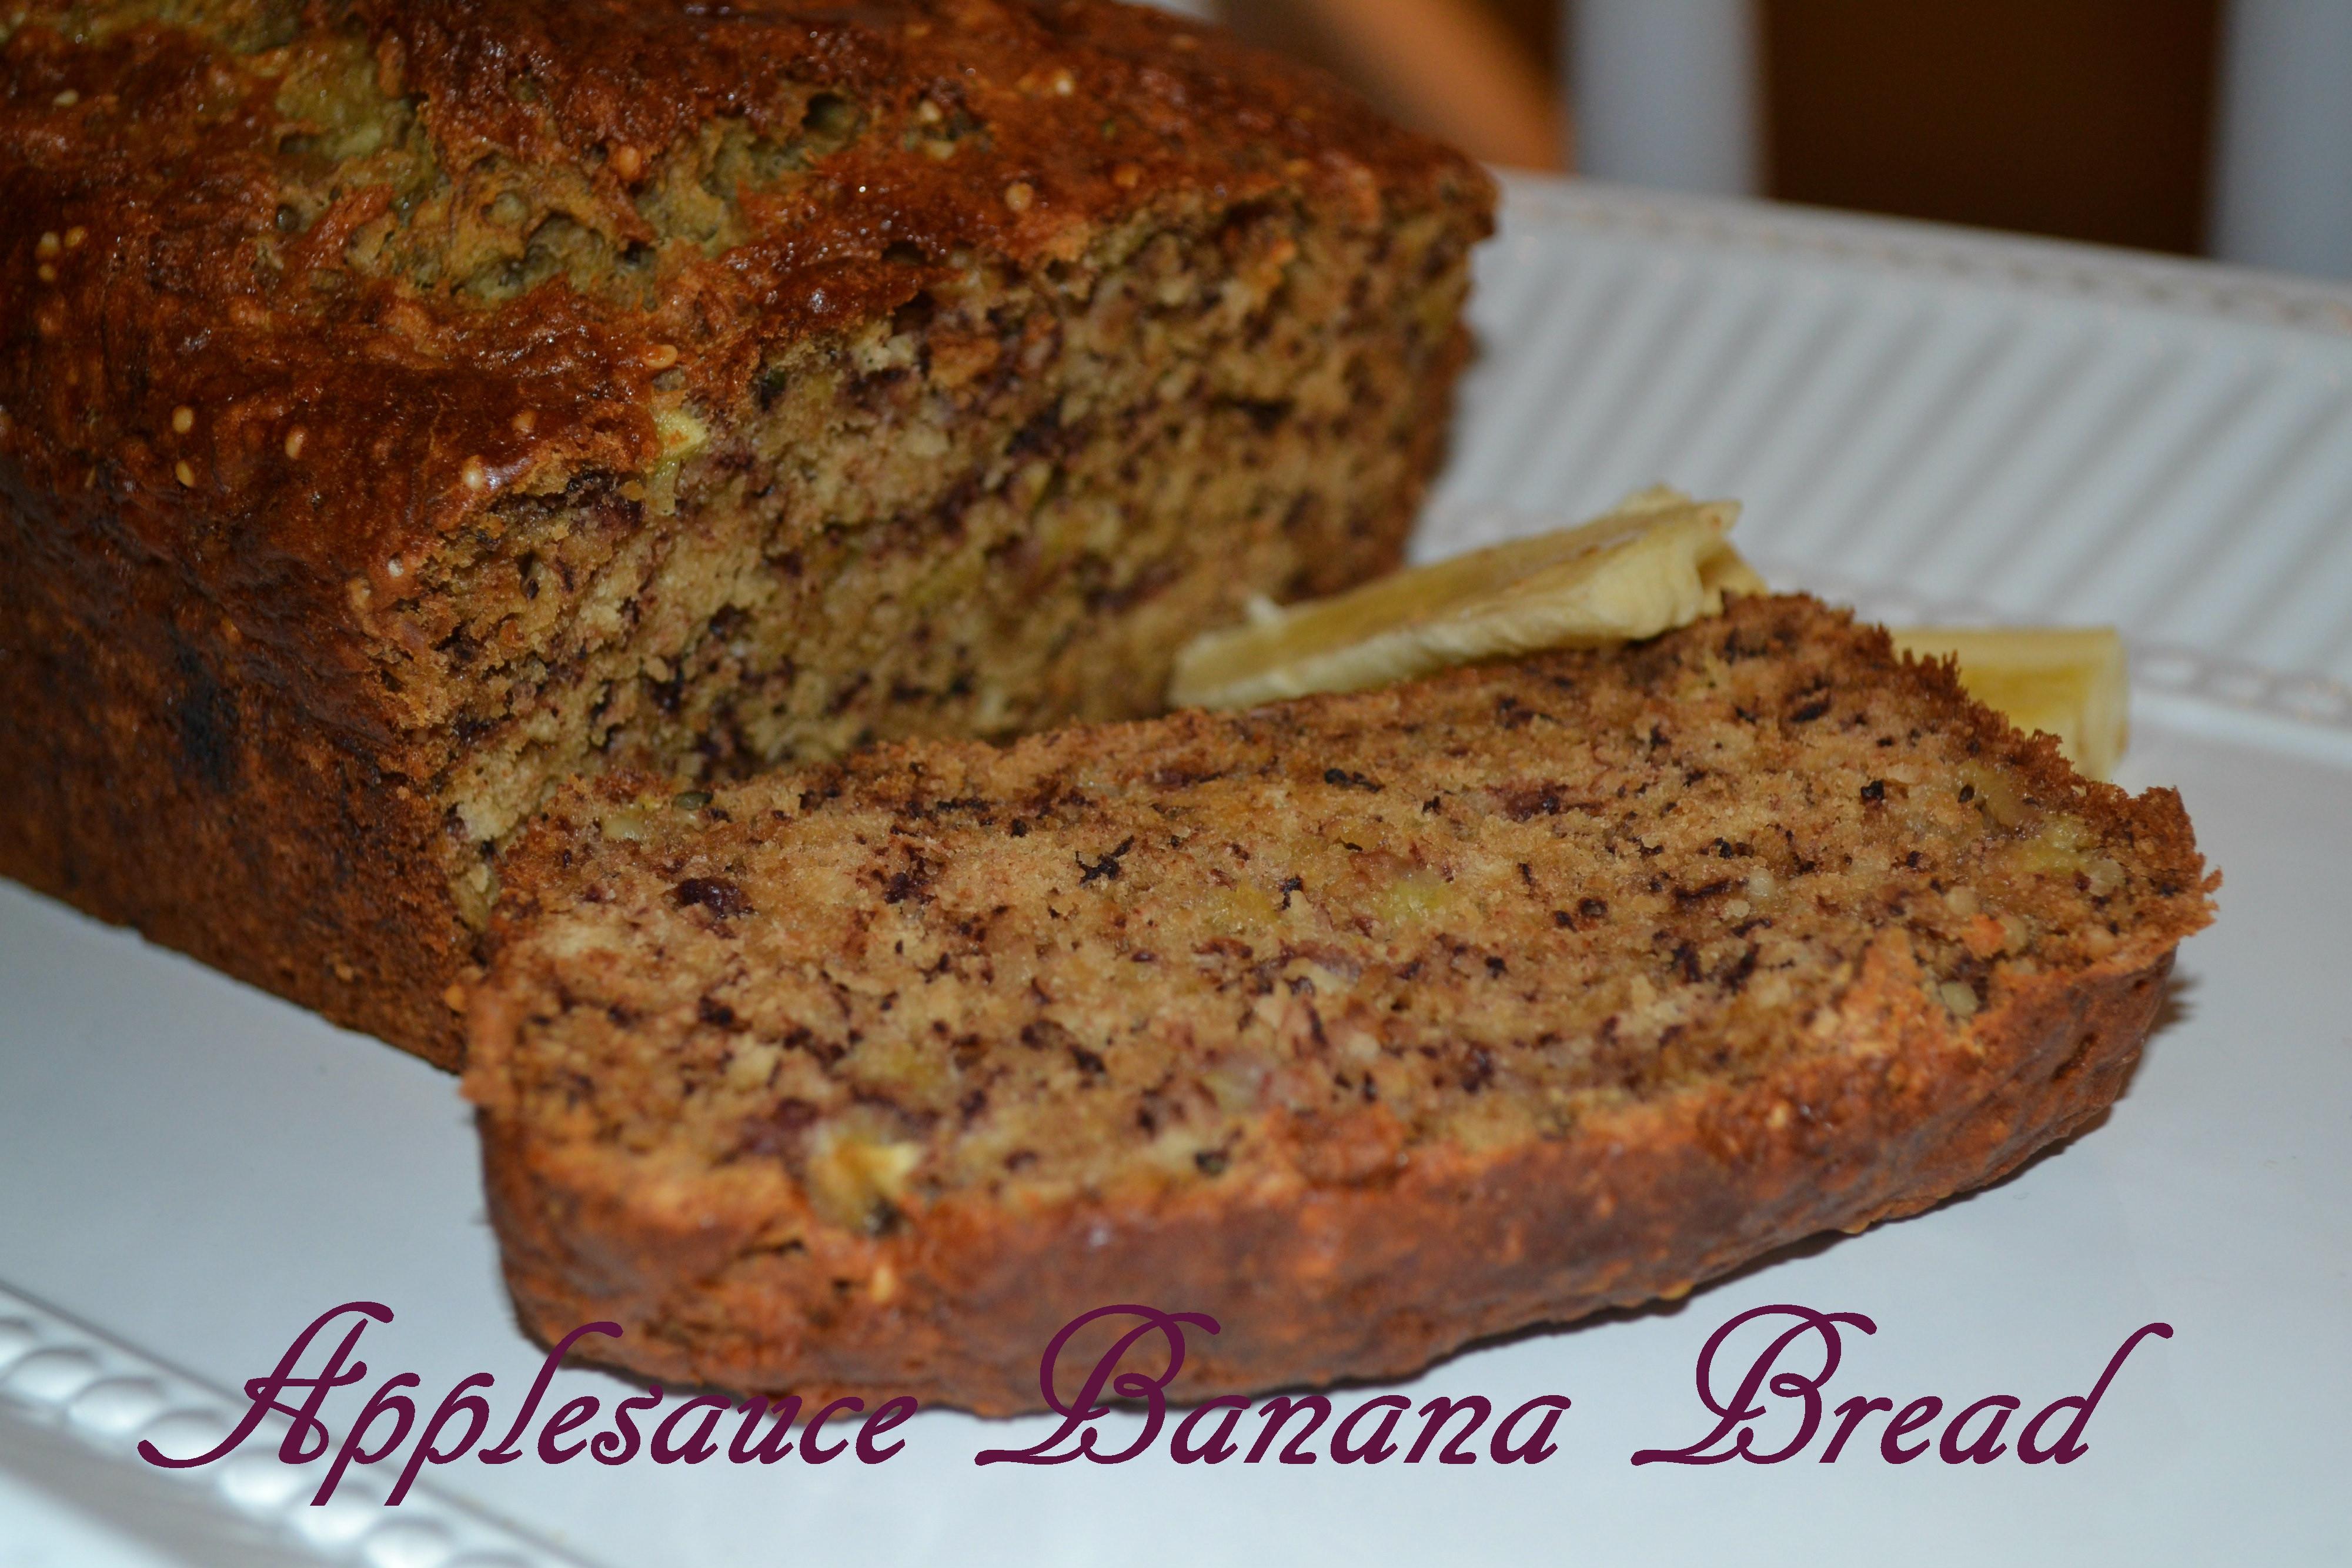 Banana Bread Recipe With Applesauce  Applesauce Banana Bread – yummyforyourtummy♥